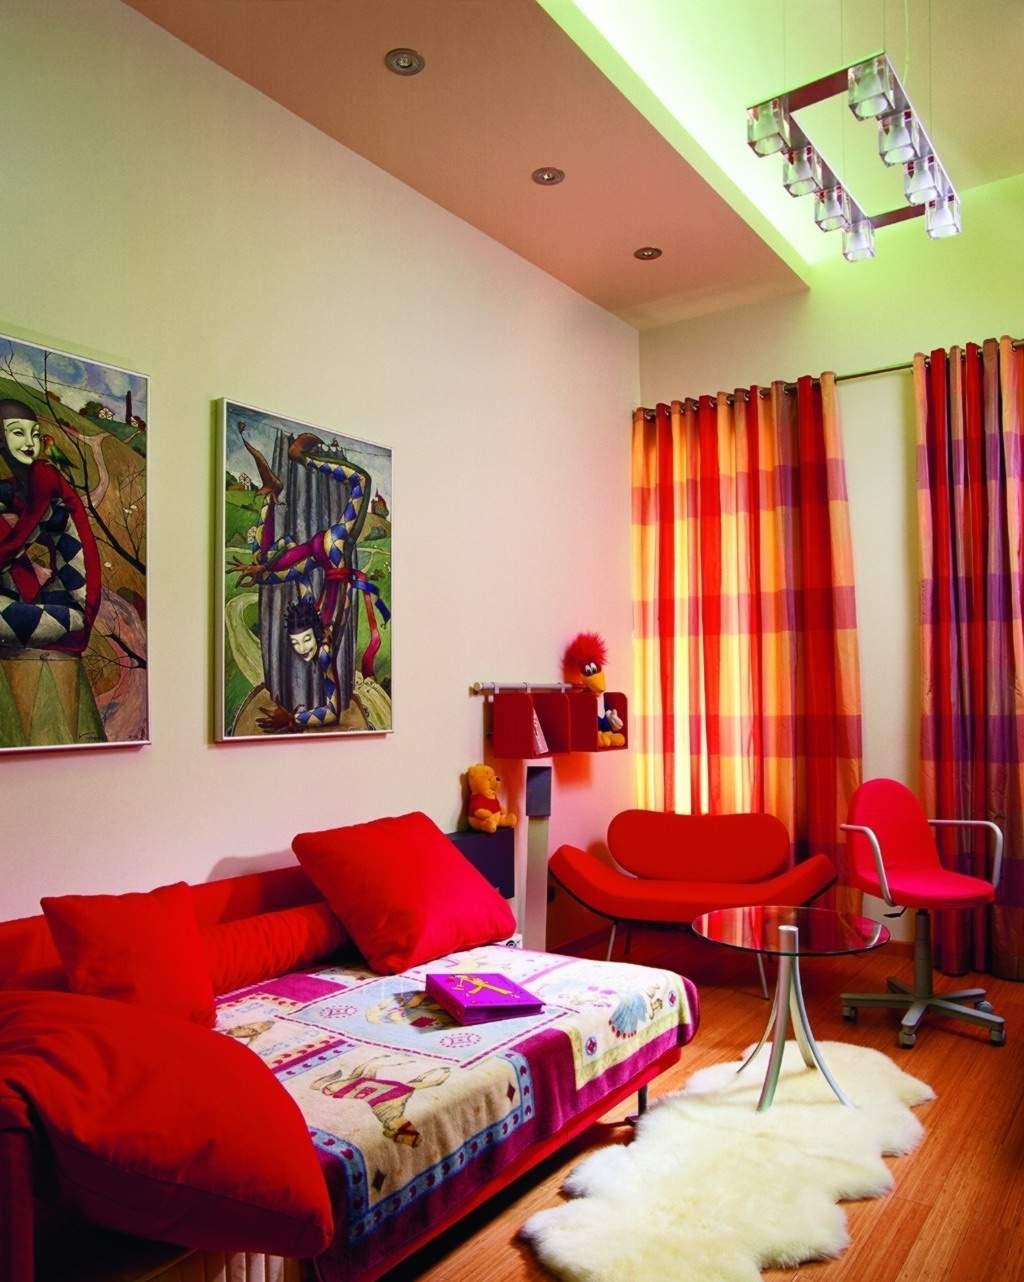 27 Comfortable Living Room Design Ideas - Decoration Love